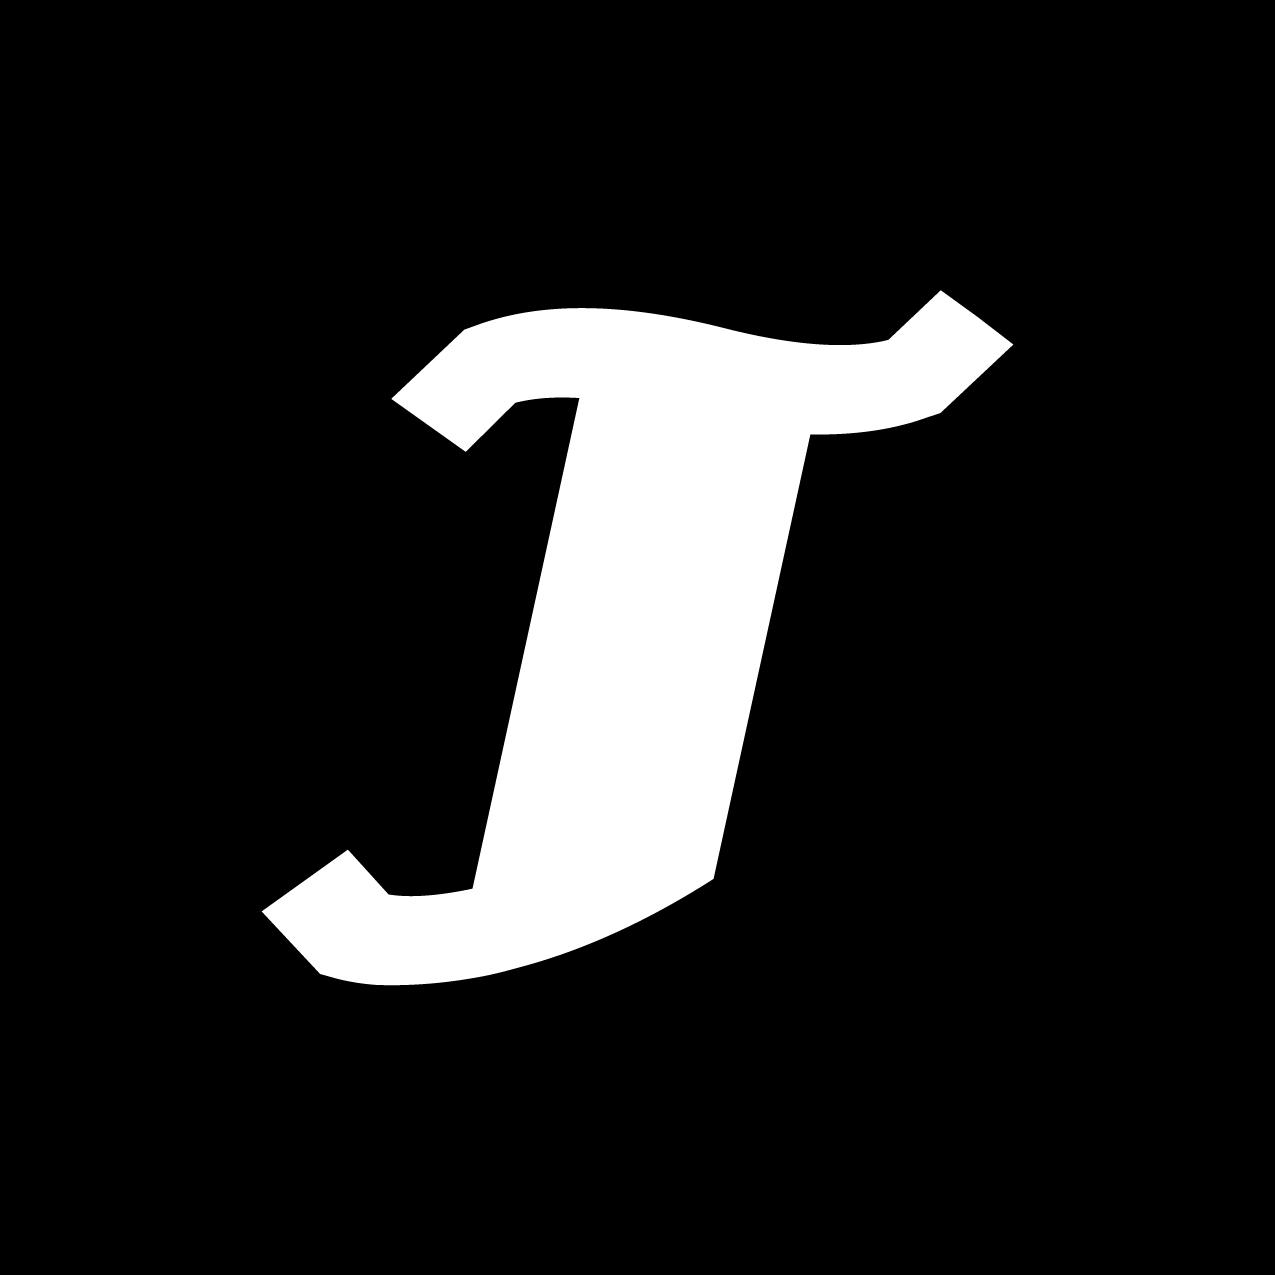 Letter J4 Design by Furia